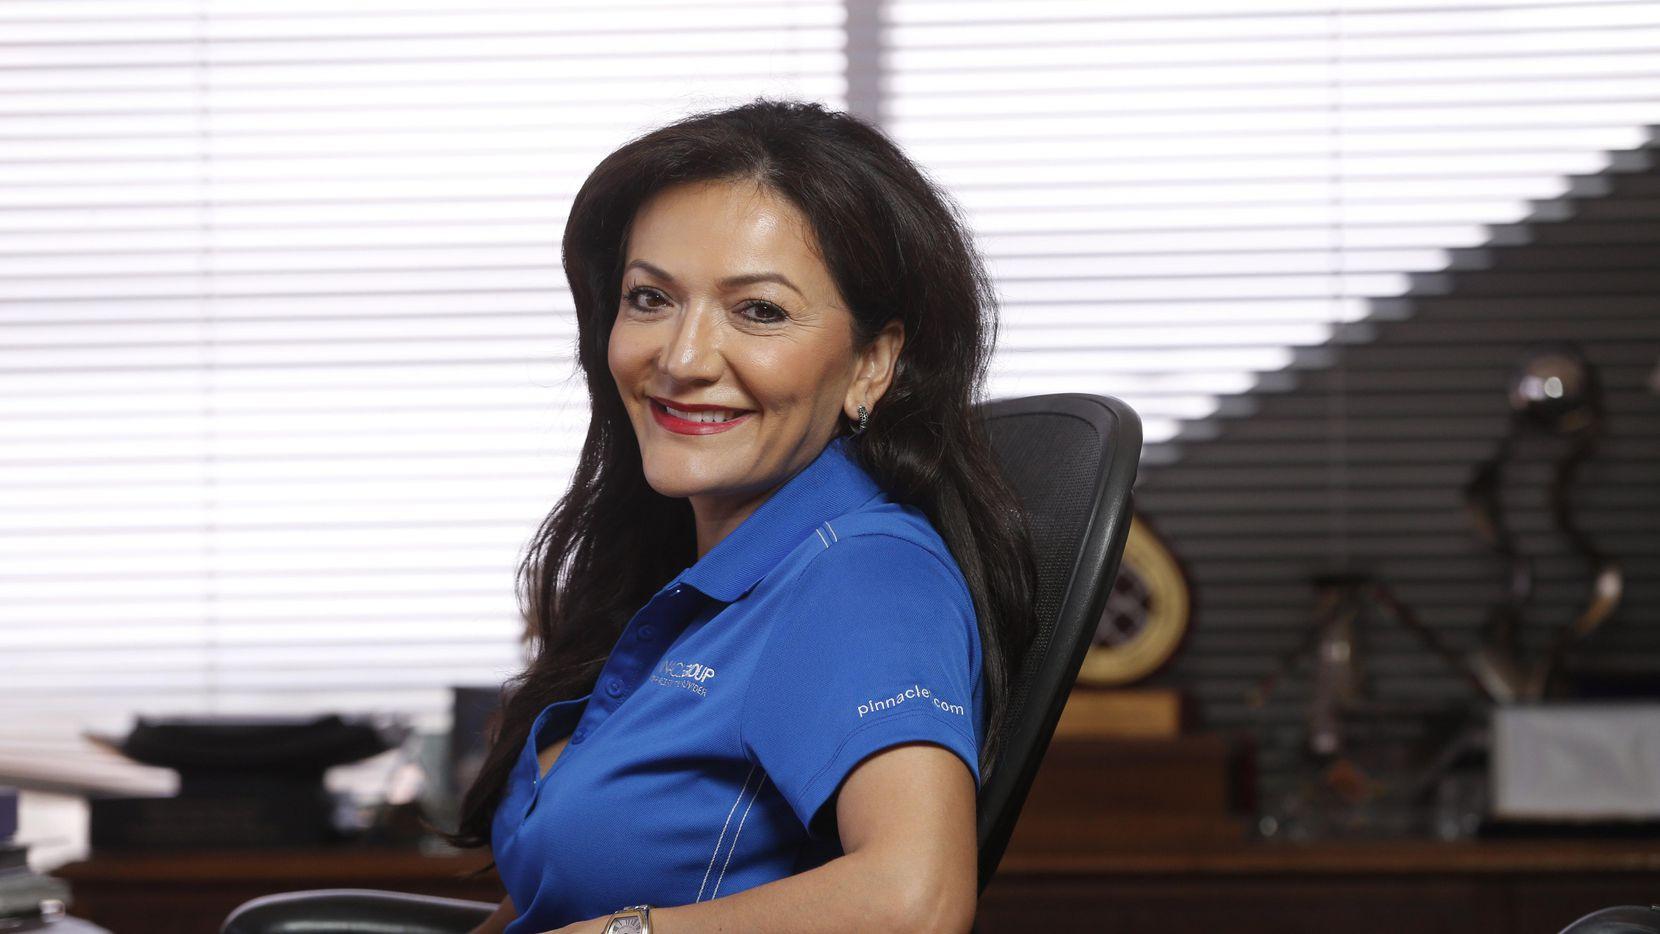 Nina Vaca, dueña de Pinnacle Group, en su oficina en Dallas. (DMN/NATHAN HUNSINGER)